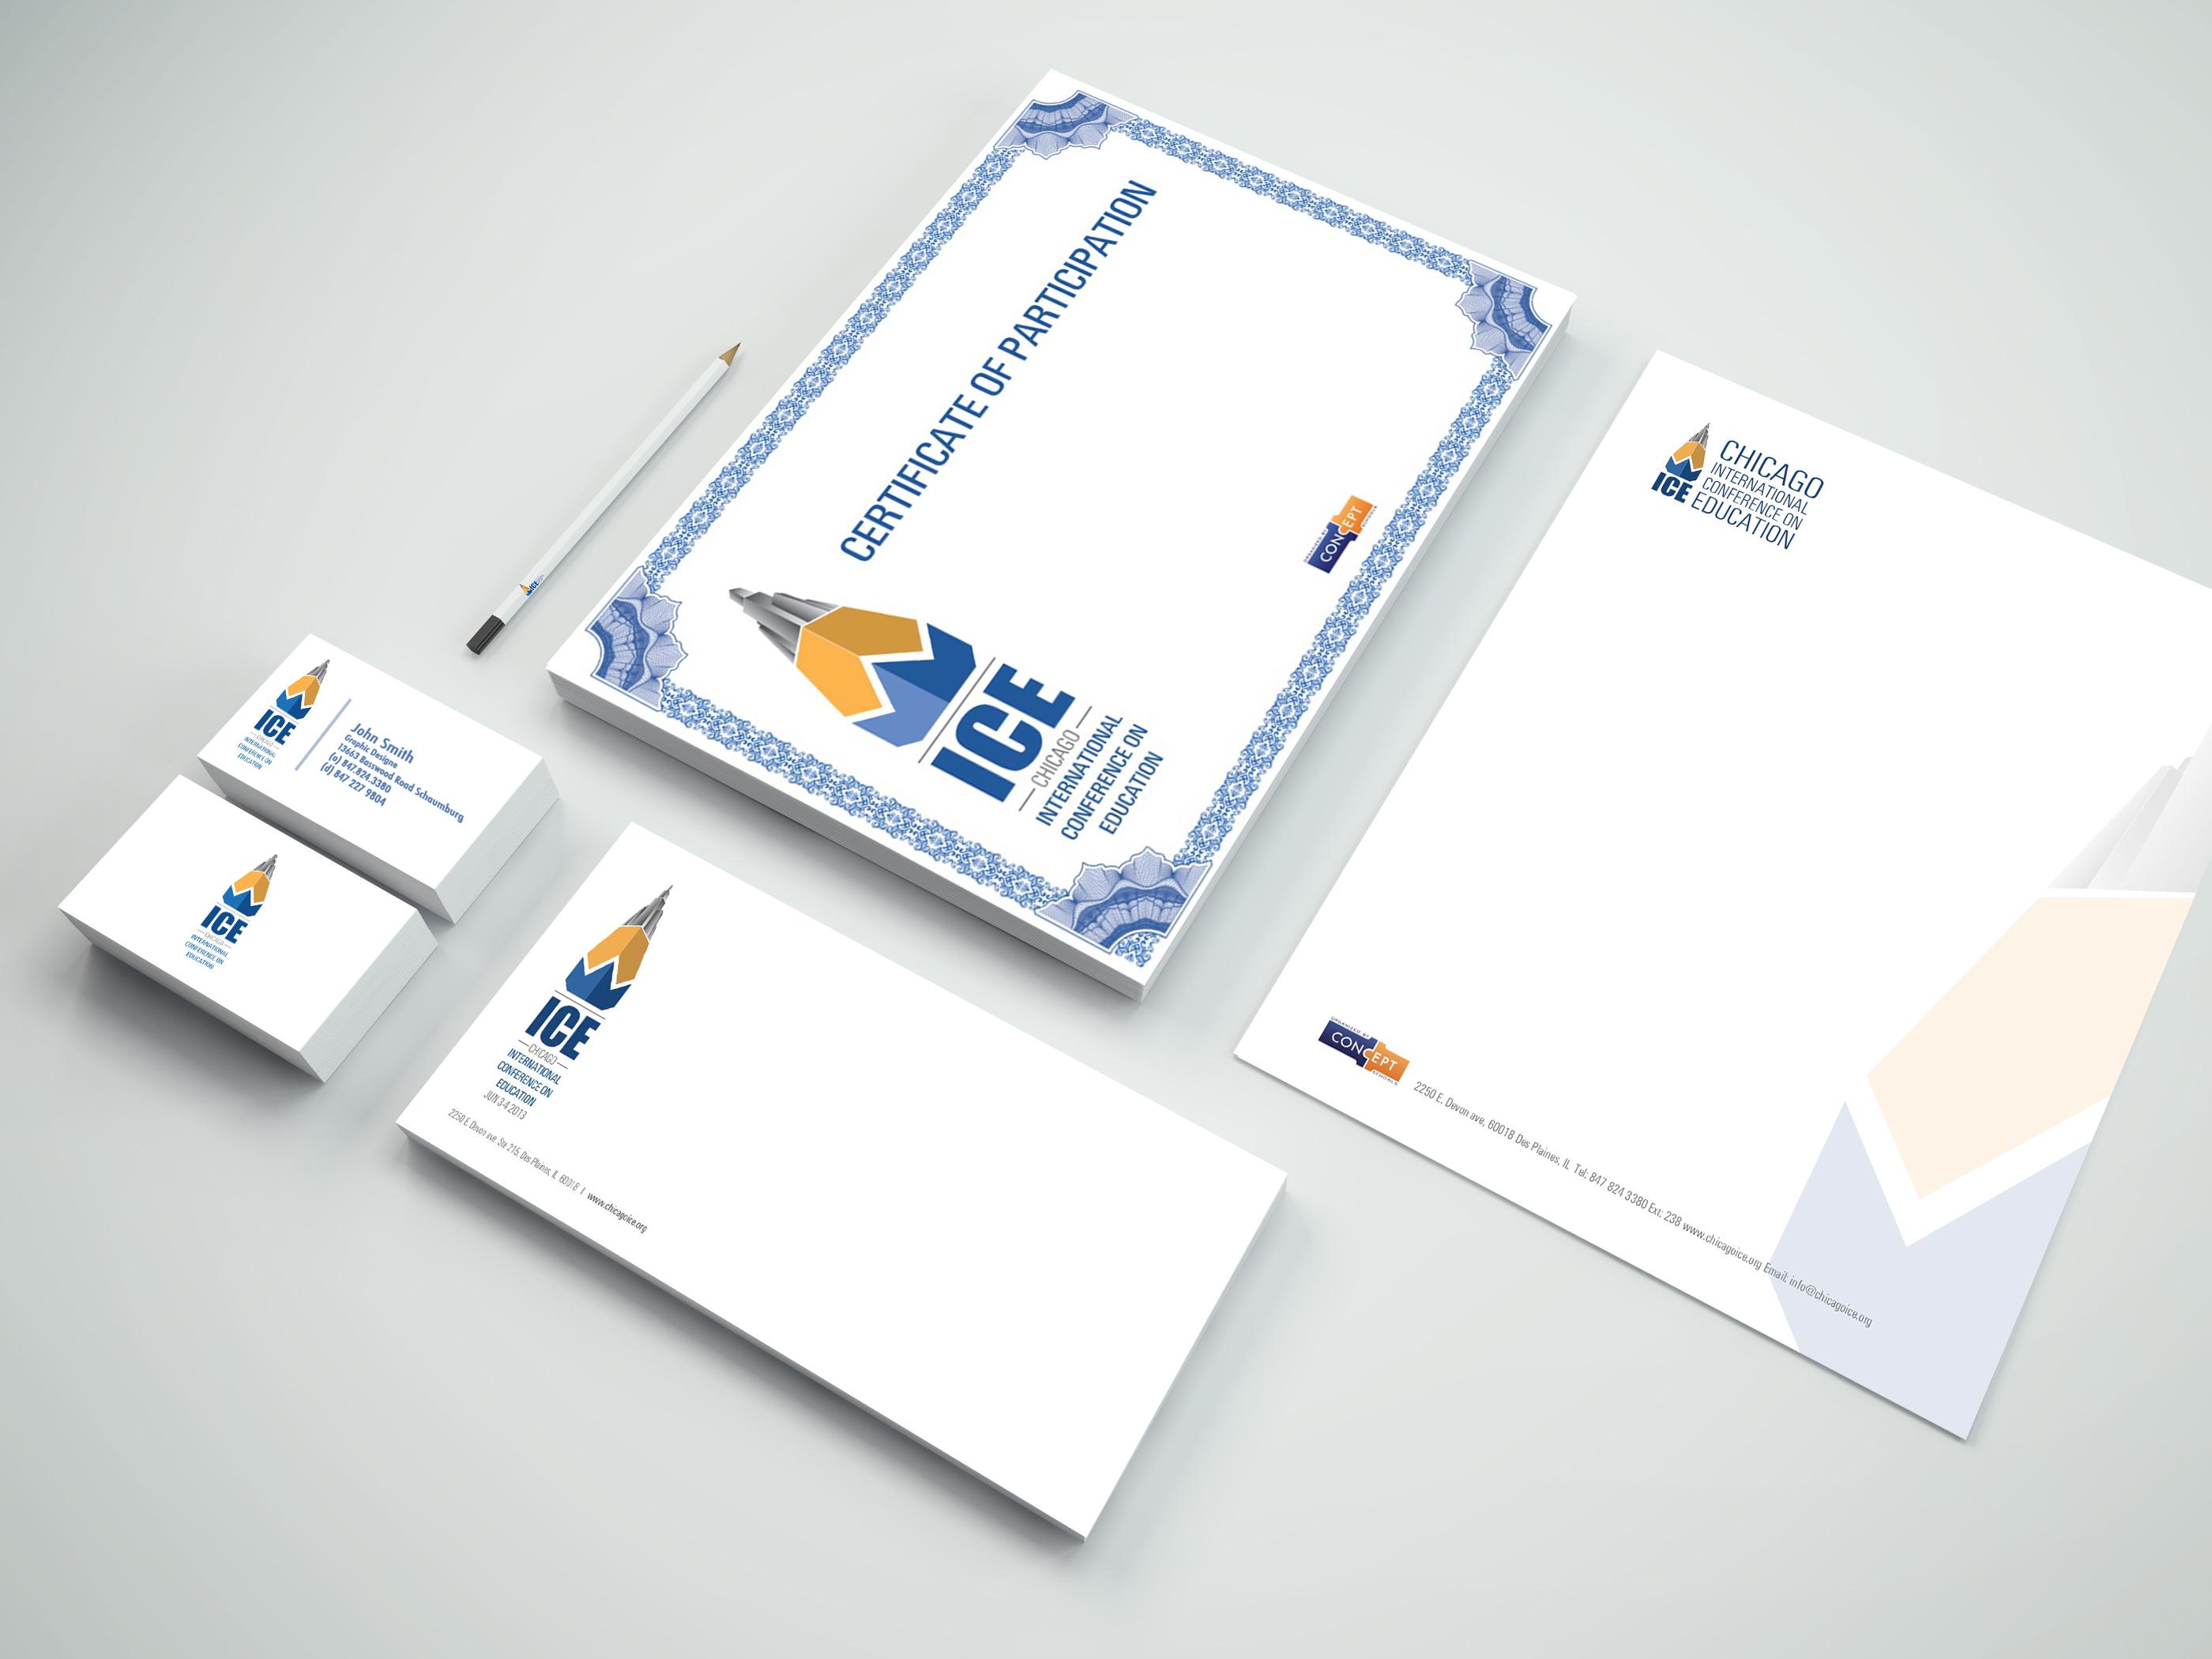 branding-stationery-mockup-vol.6